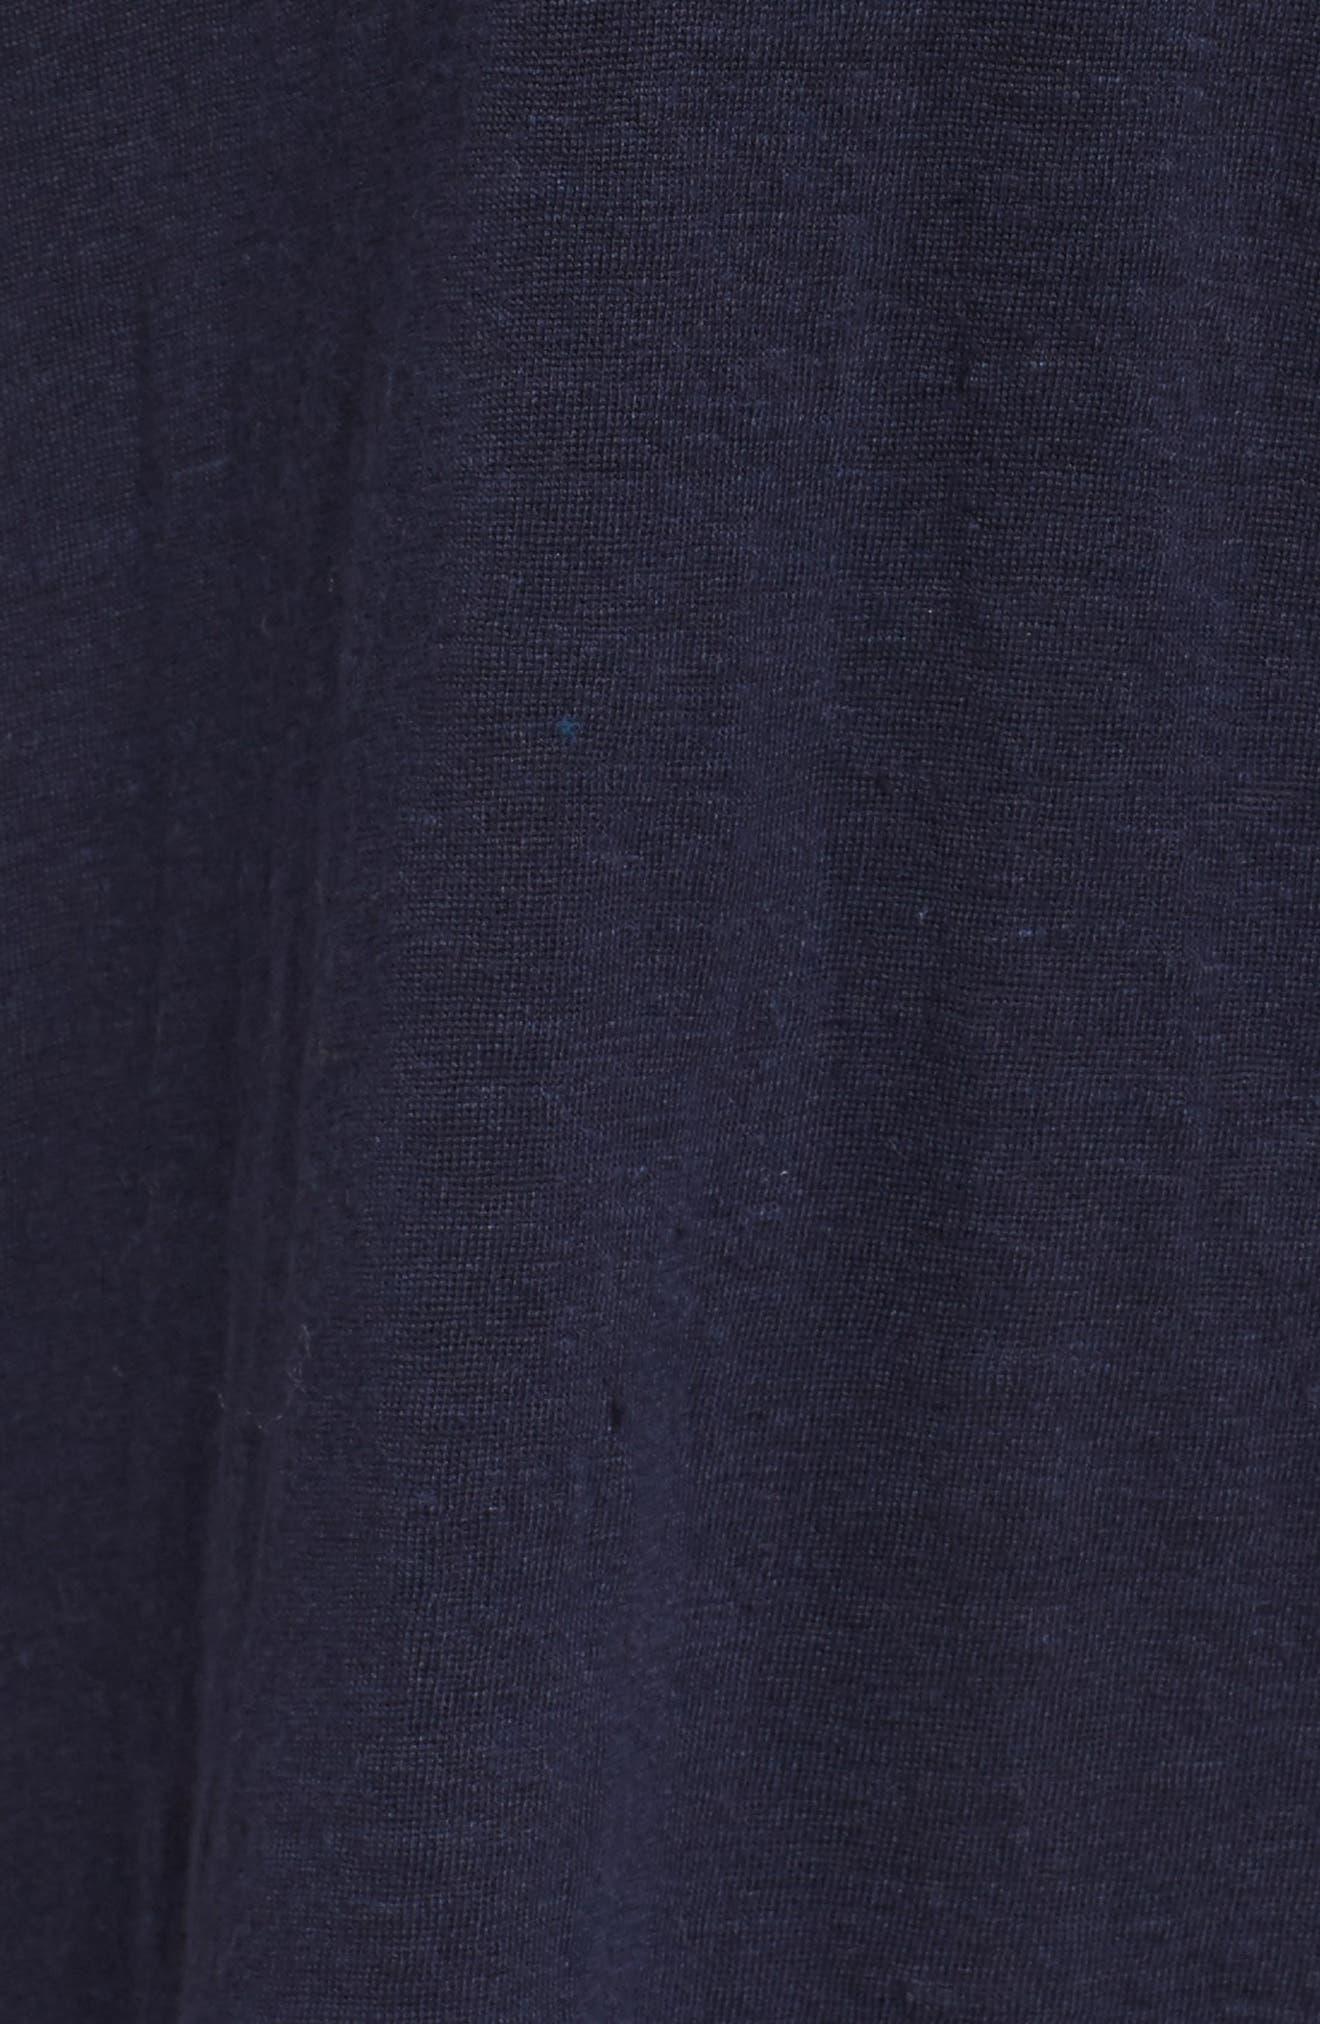 Organic Linen Top,                             Alternate thumbnail 6, color,                             Midnight